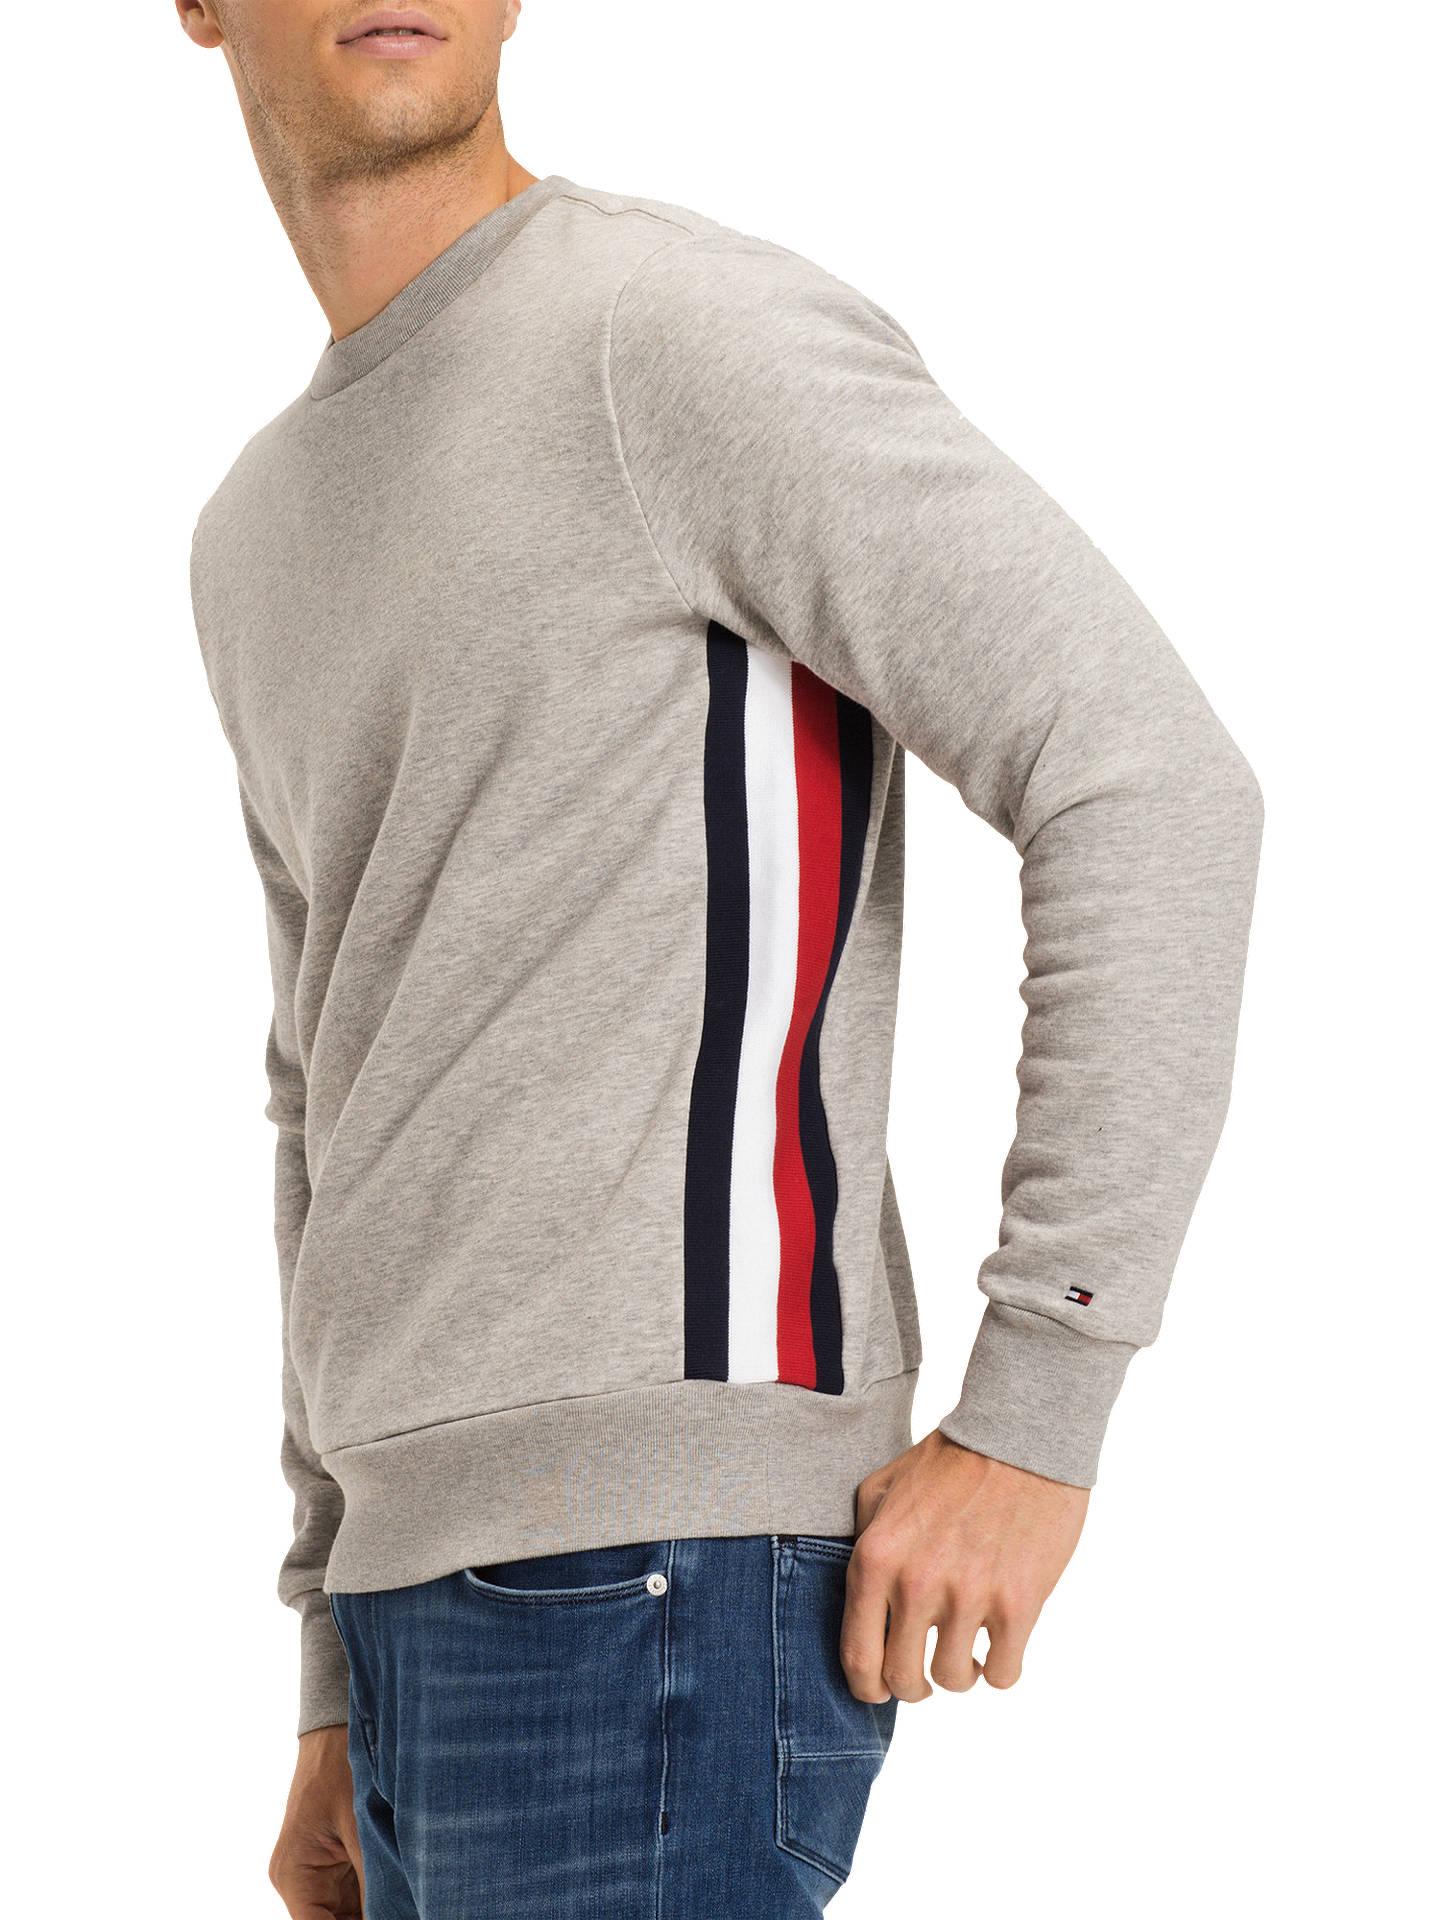 9d2a37a8a2 Buy Tommy Hilfiger Stripe Logo Sweatshirt, Cloud Heather, S Online at  johnlewis.com ...